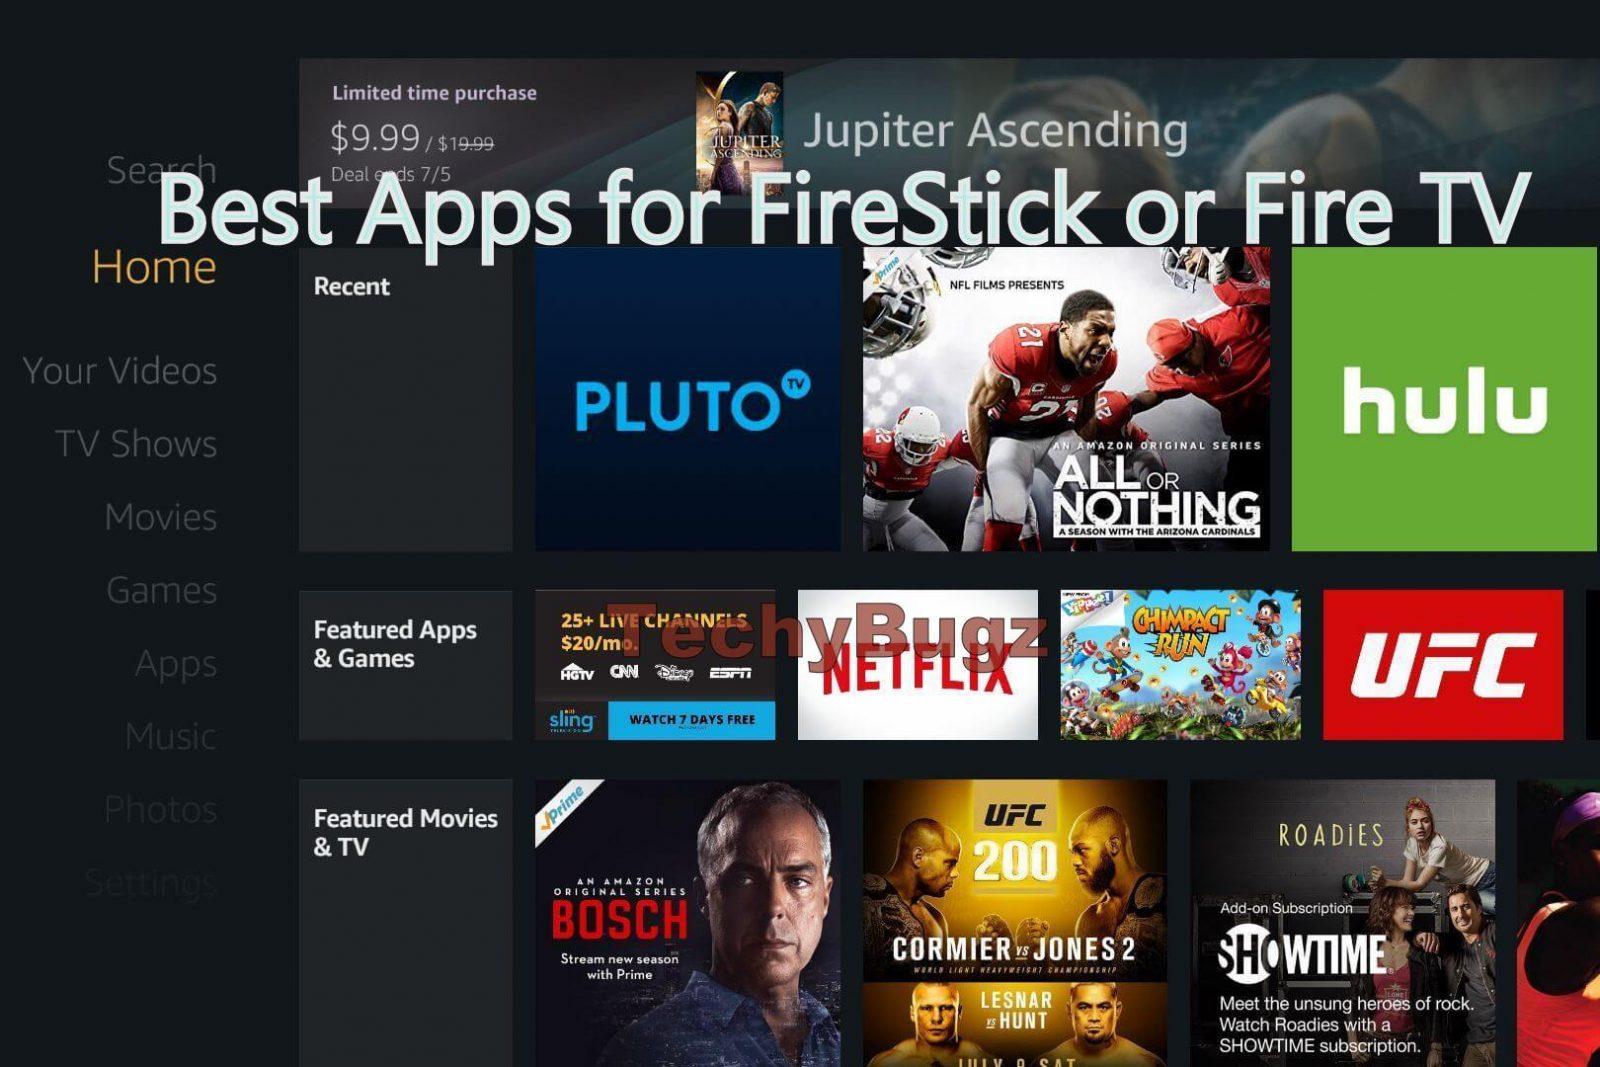 Best Apps for FireStick or Fire TV (2019) - Techy Bugz